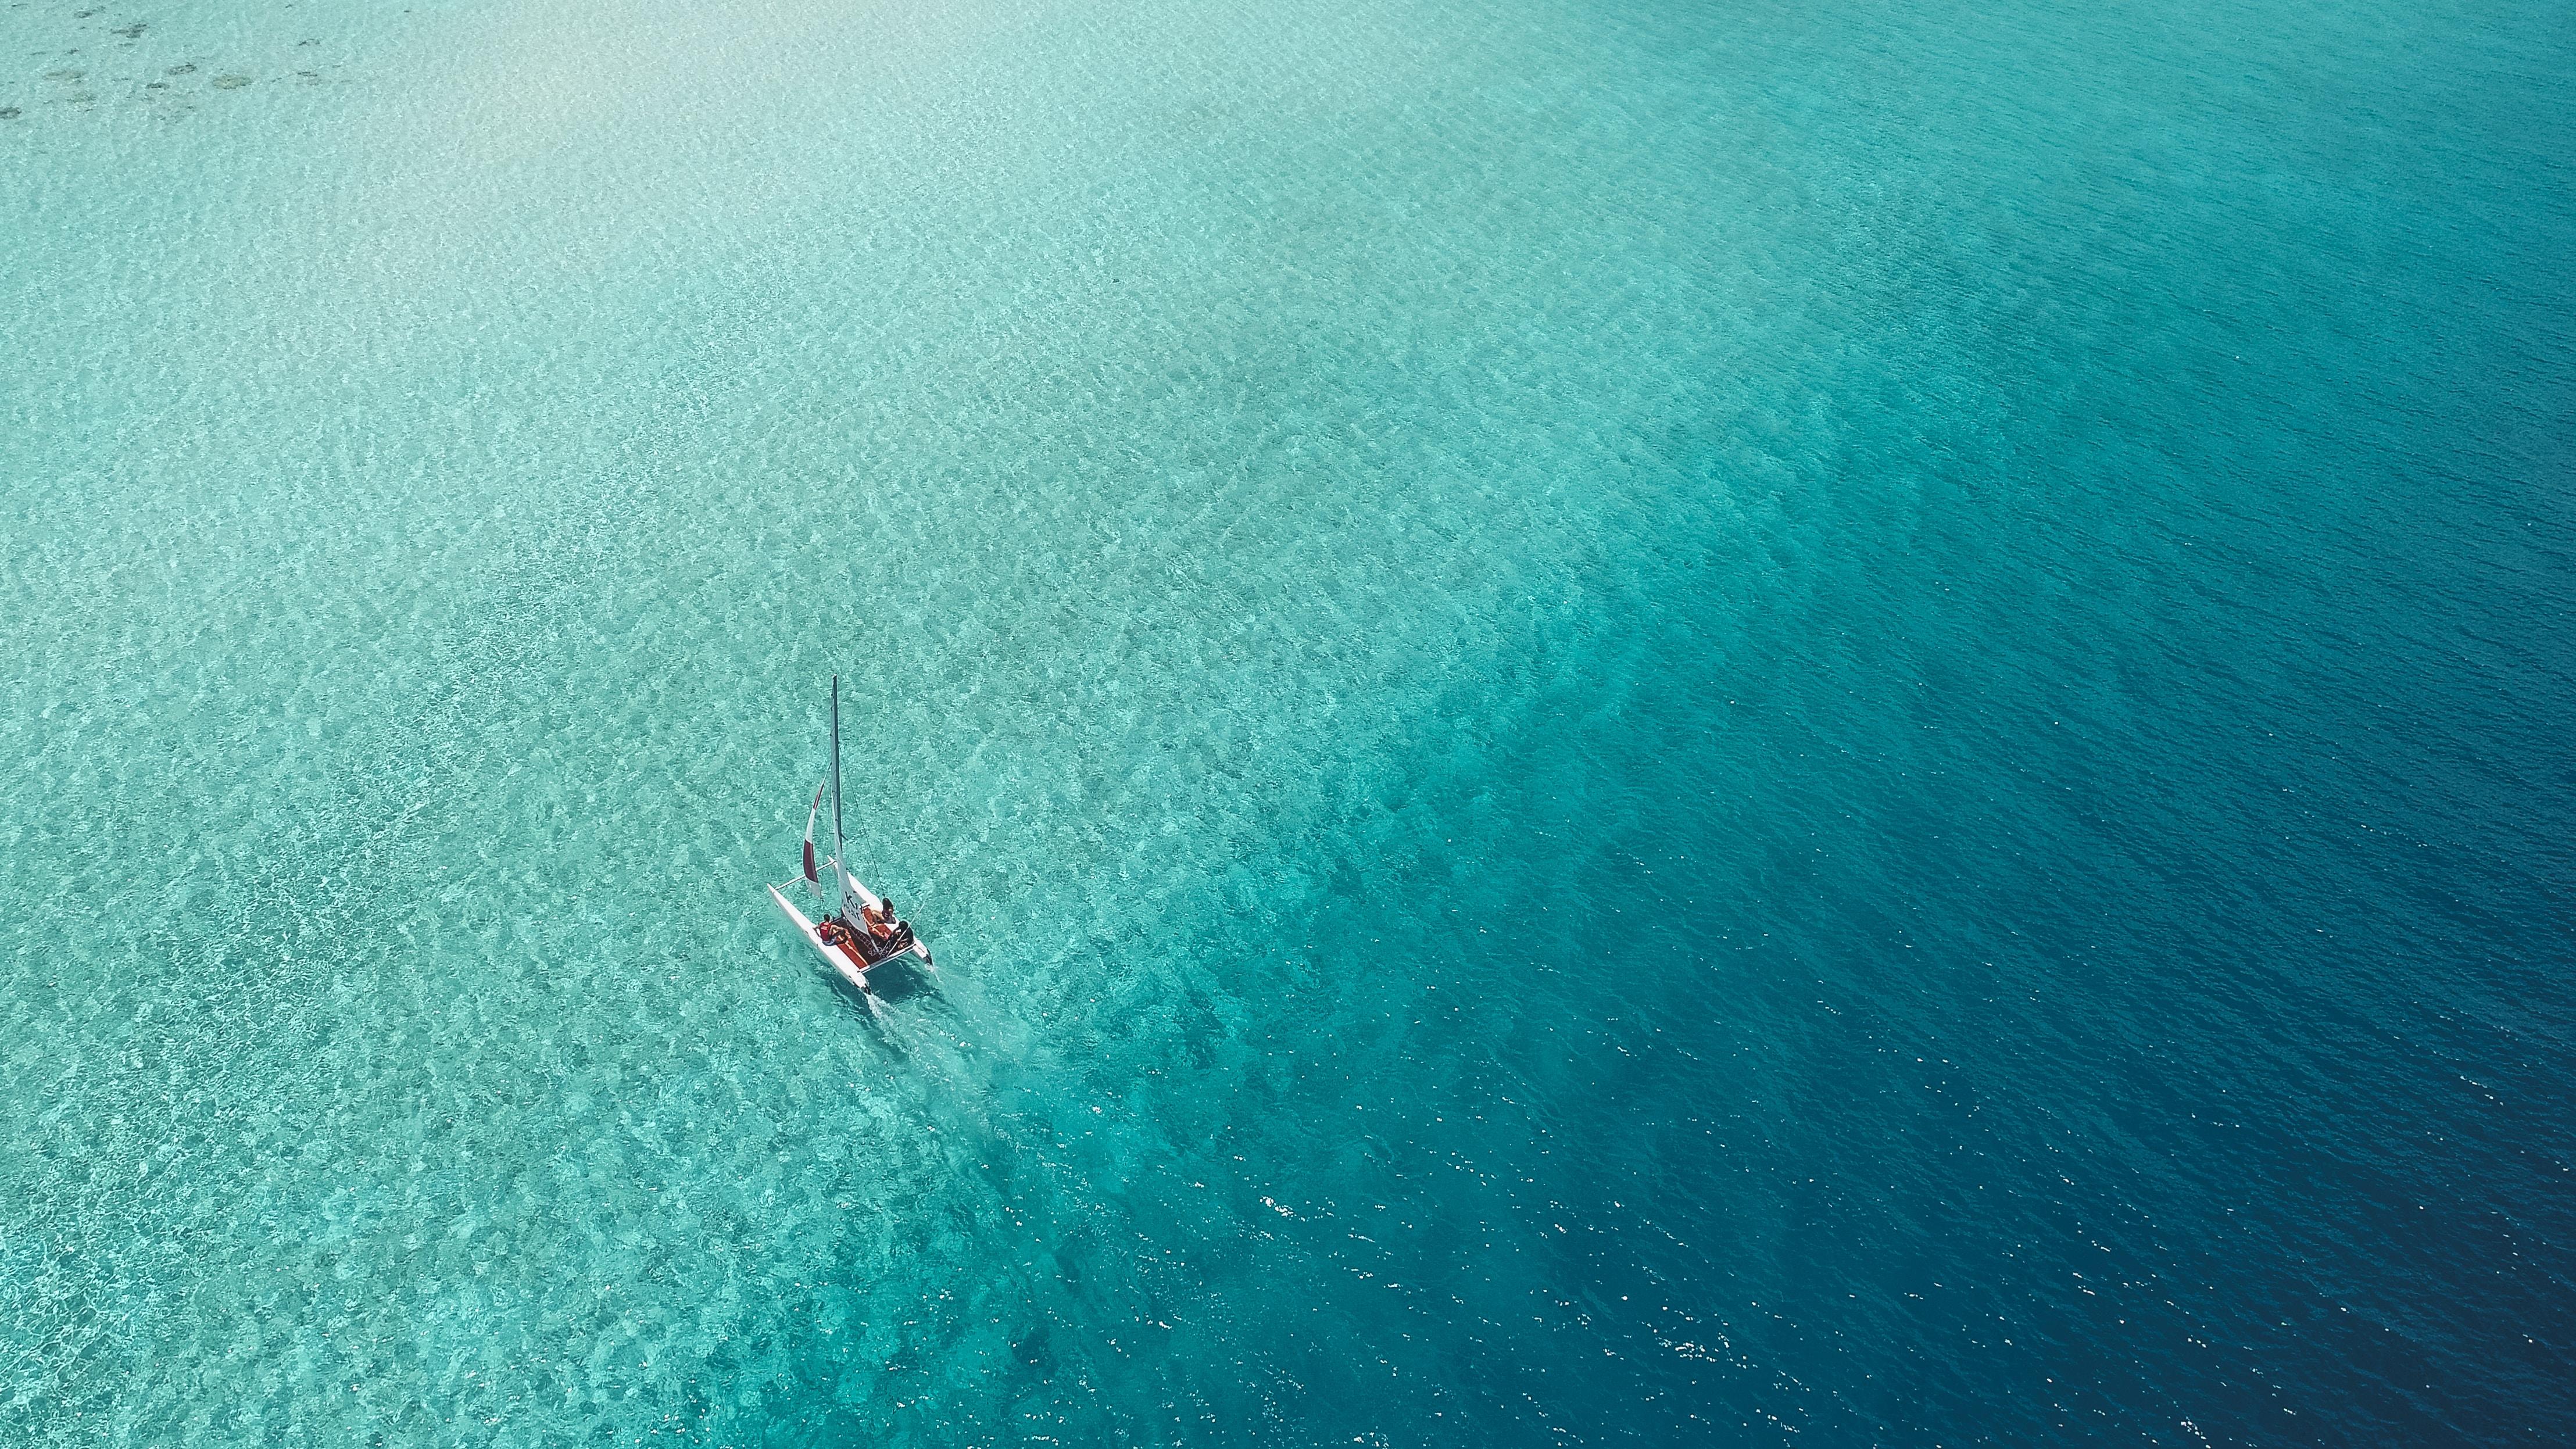 A catamaran sails across a shallow reef in the Maldives